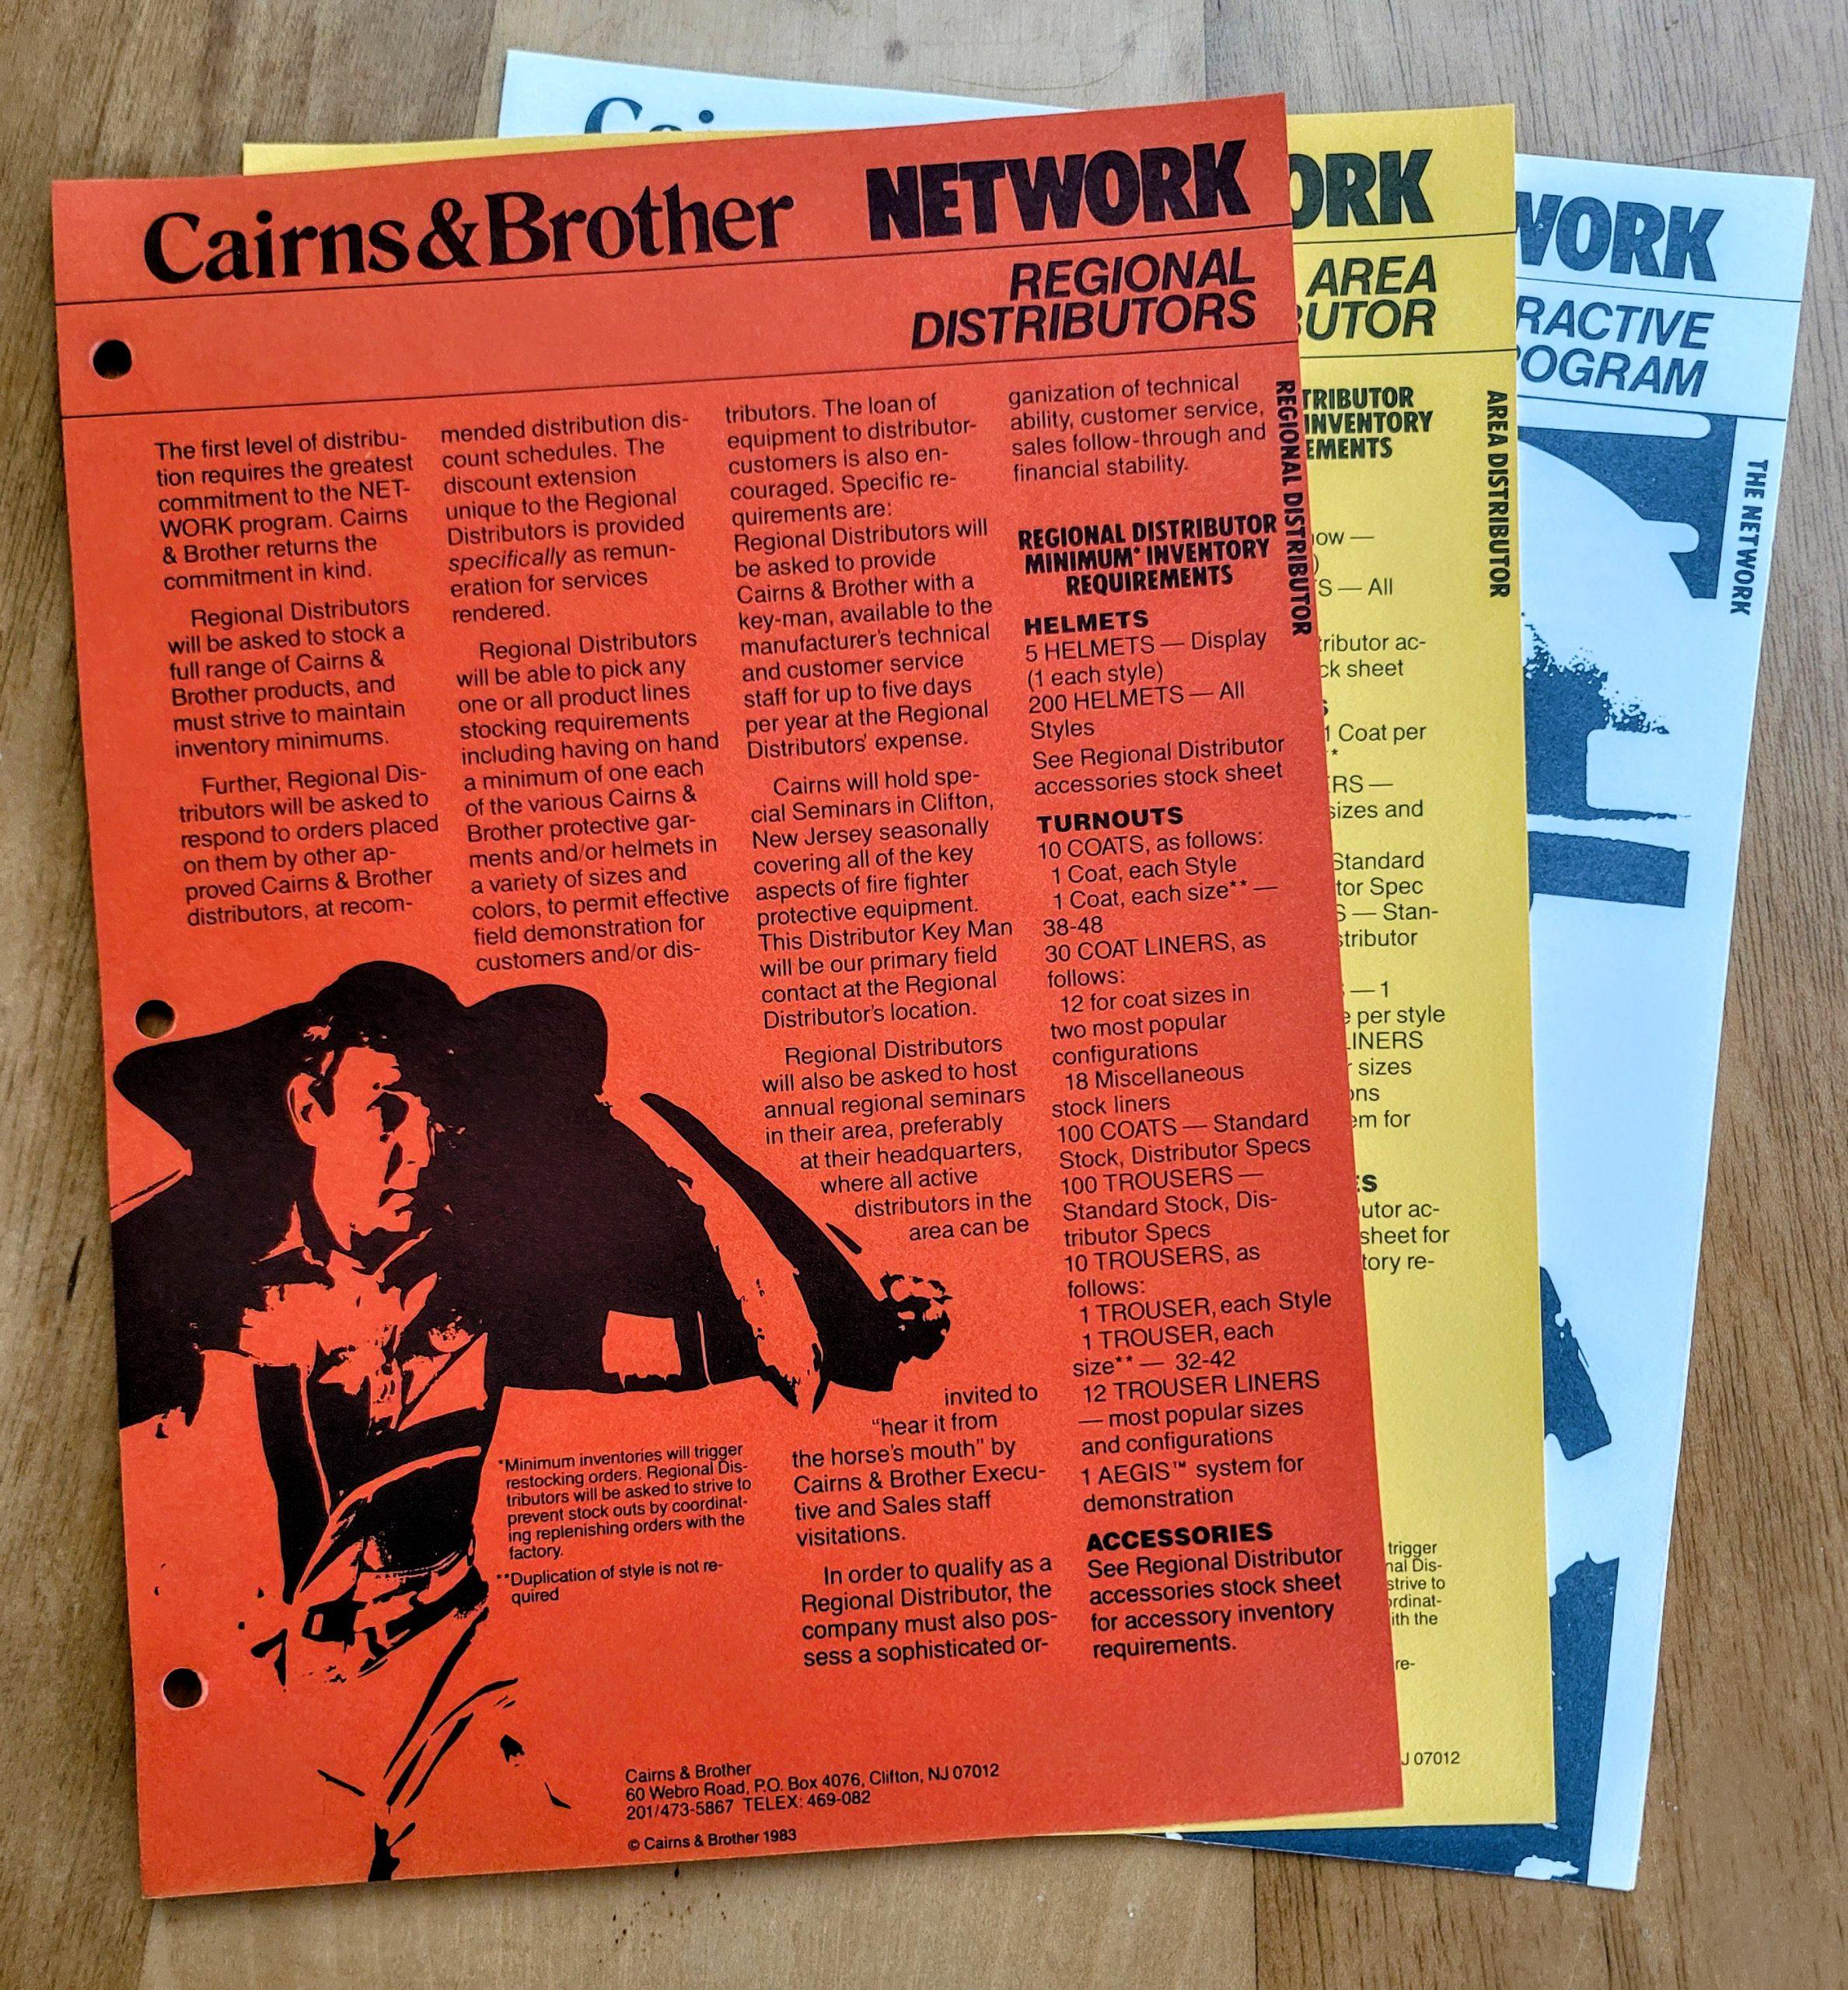 cairns_distribution network_brochure_21